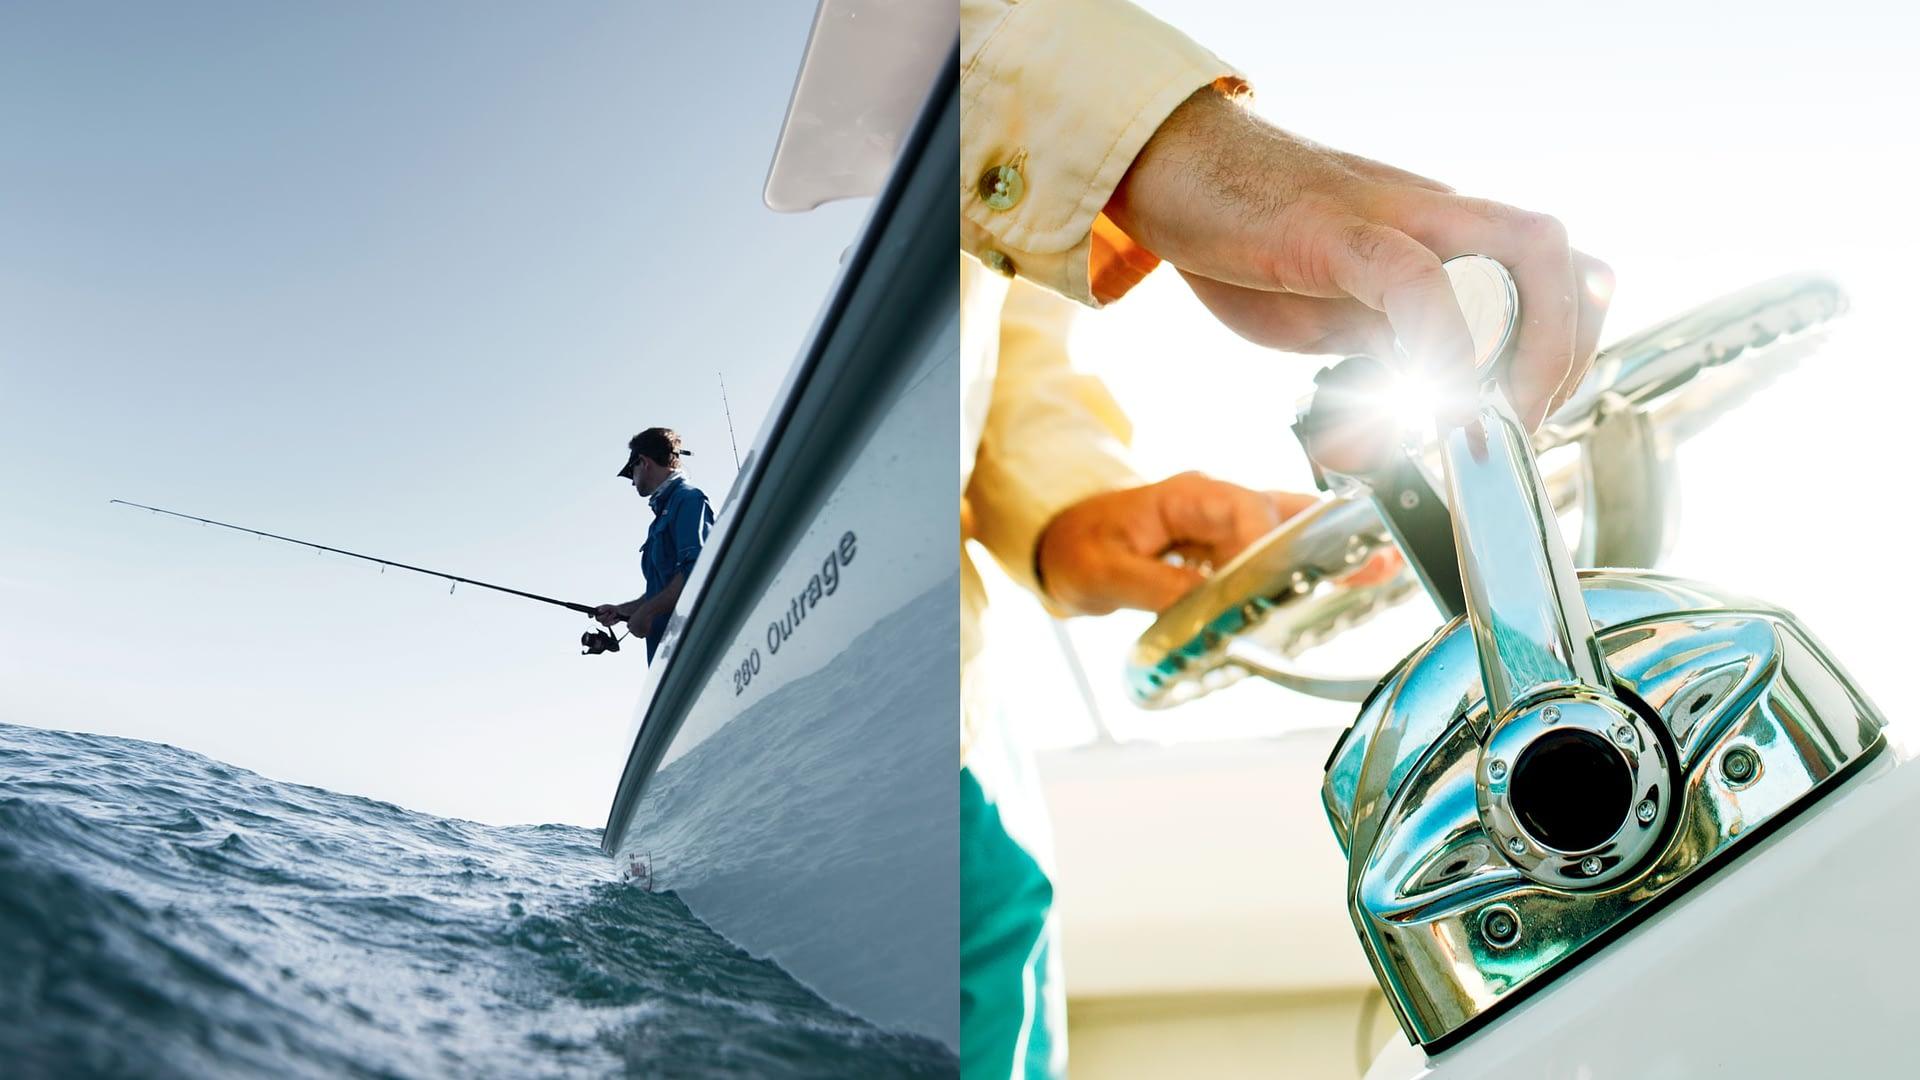 Close ups of boat equipment and man fishing.